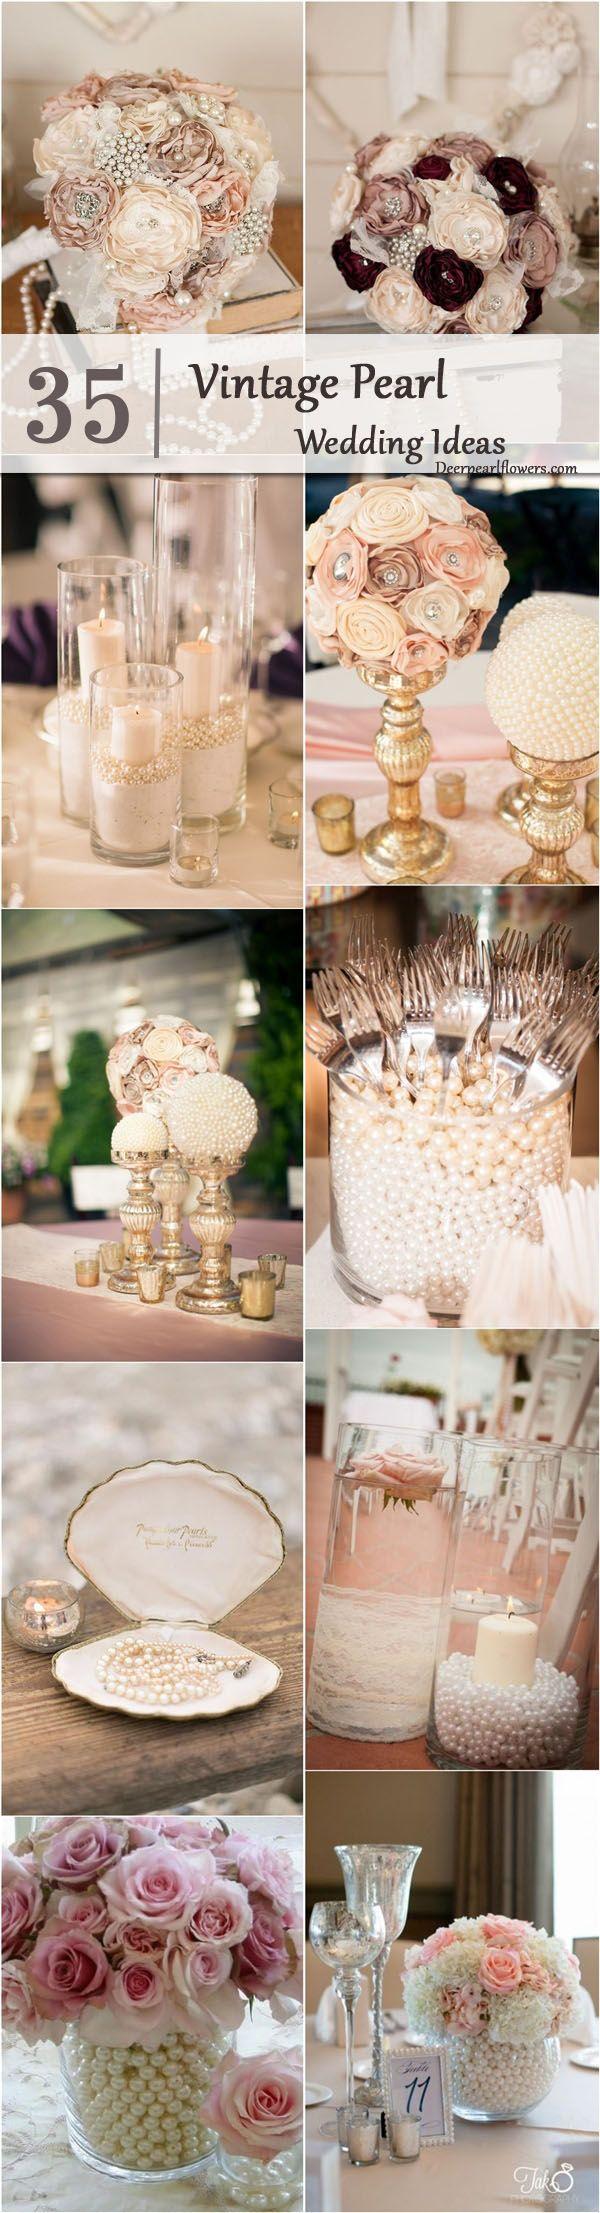 35 chic vintage pearl wedding ideas you'll love | vintage pearls